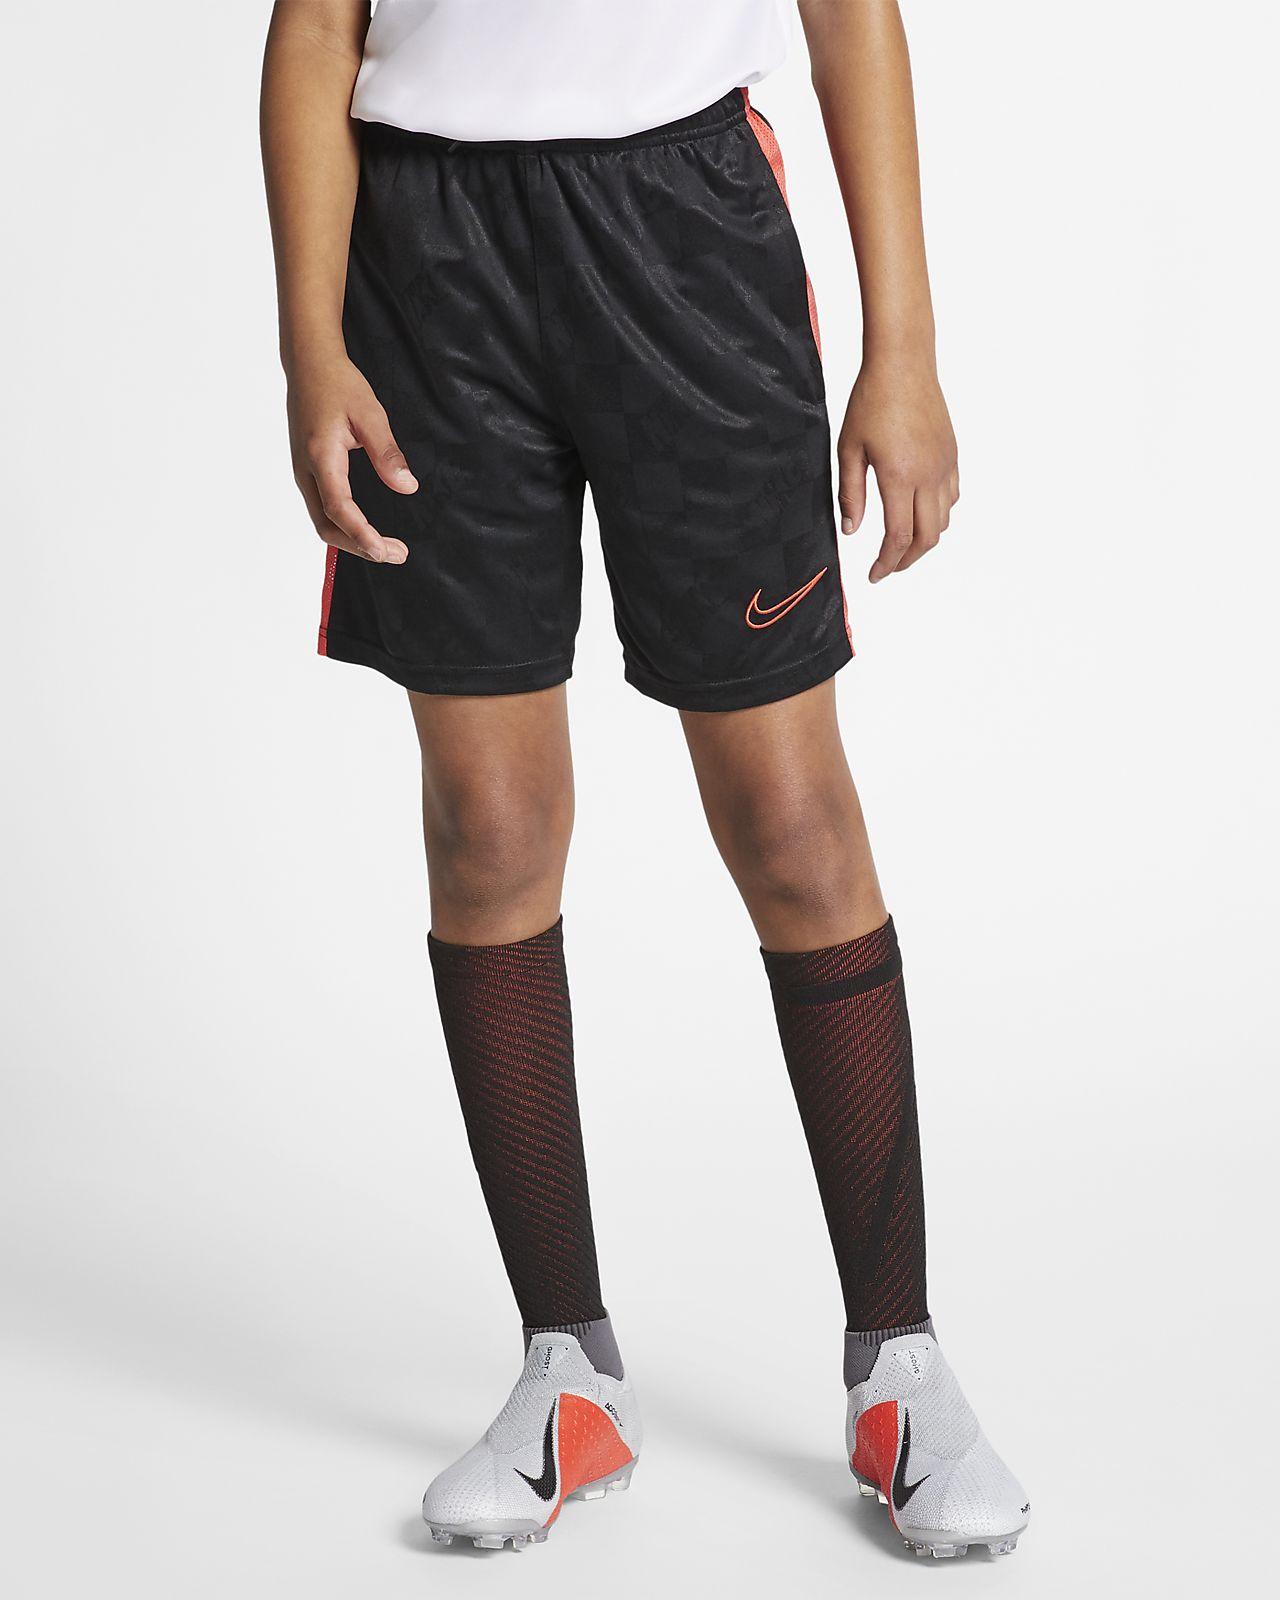 Shorts de fútbol para niños talla grande Nike Breathe Academy